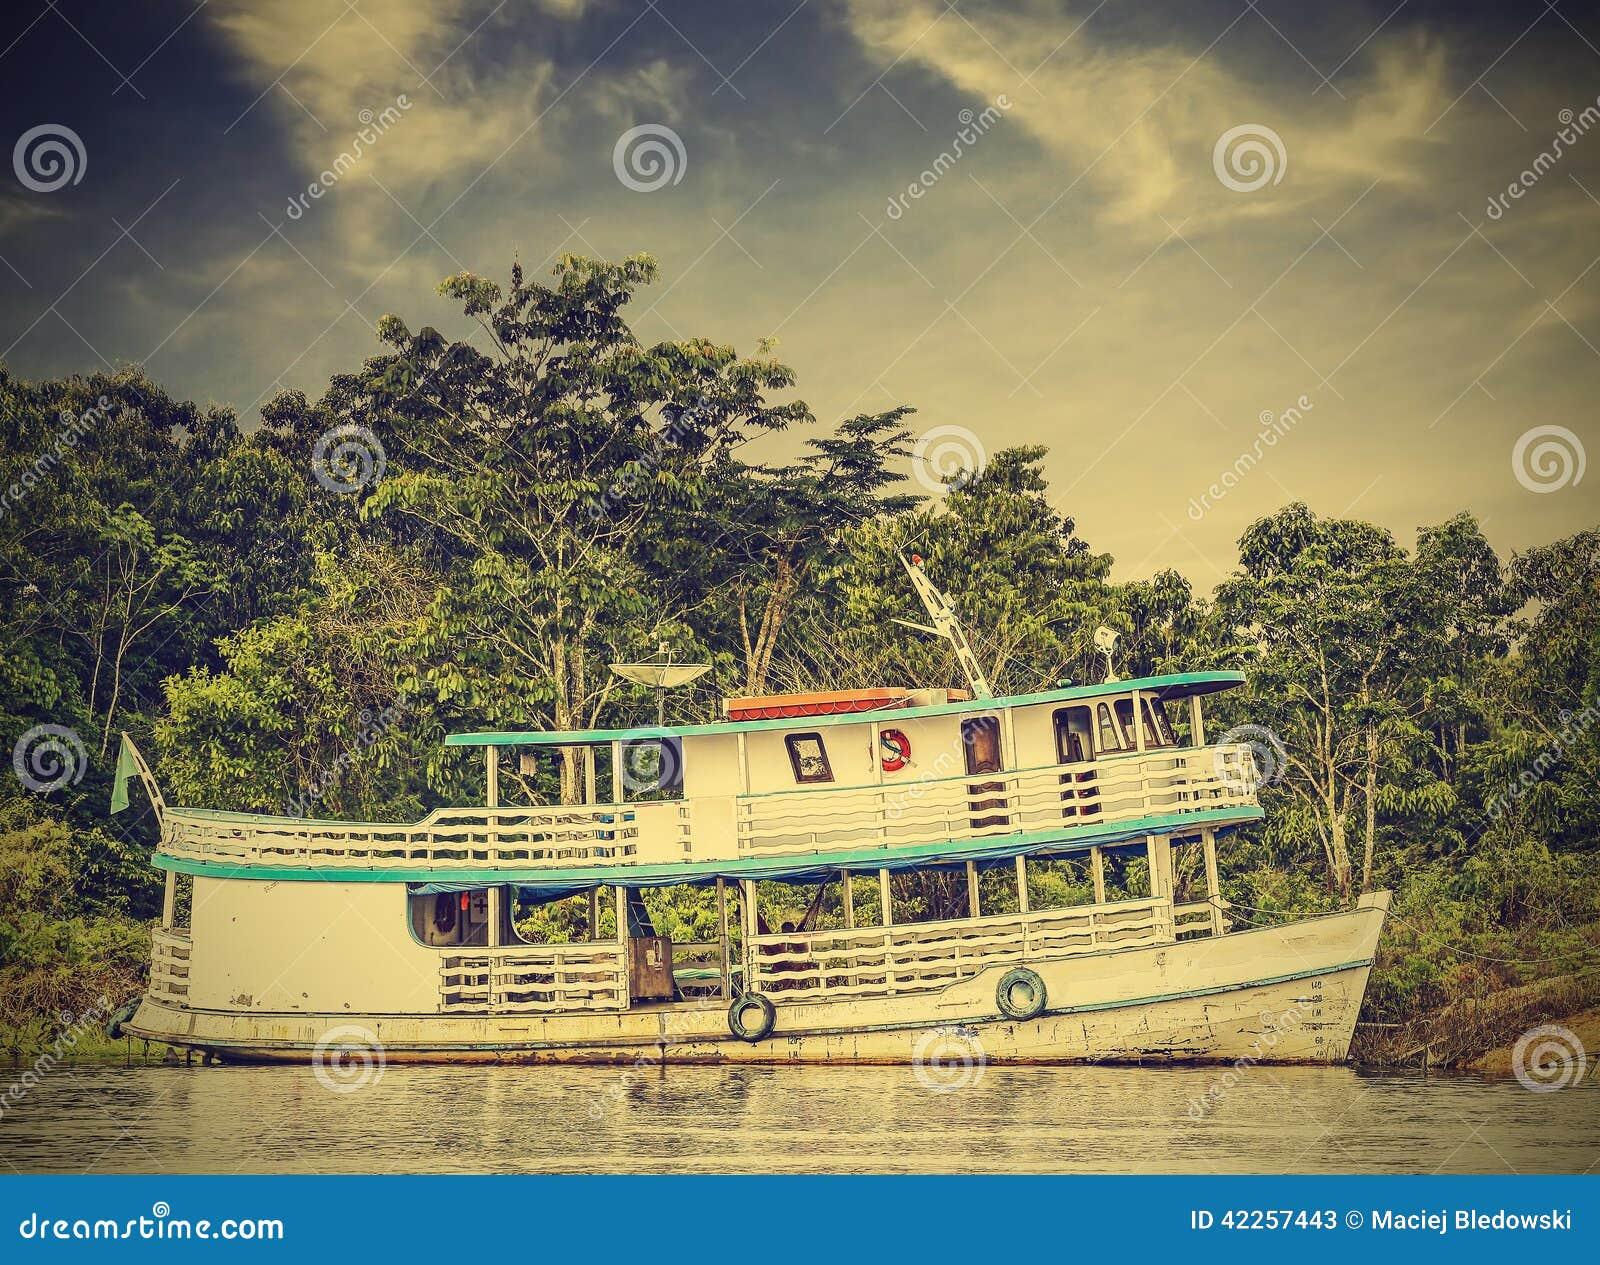 Wooden Boat On The Amazon River, Brazil, Vintage Retro ...